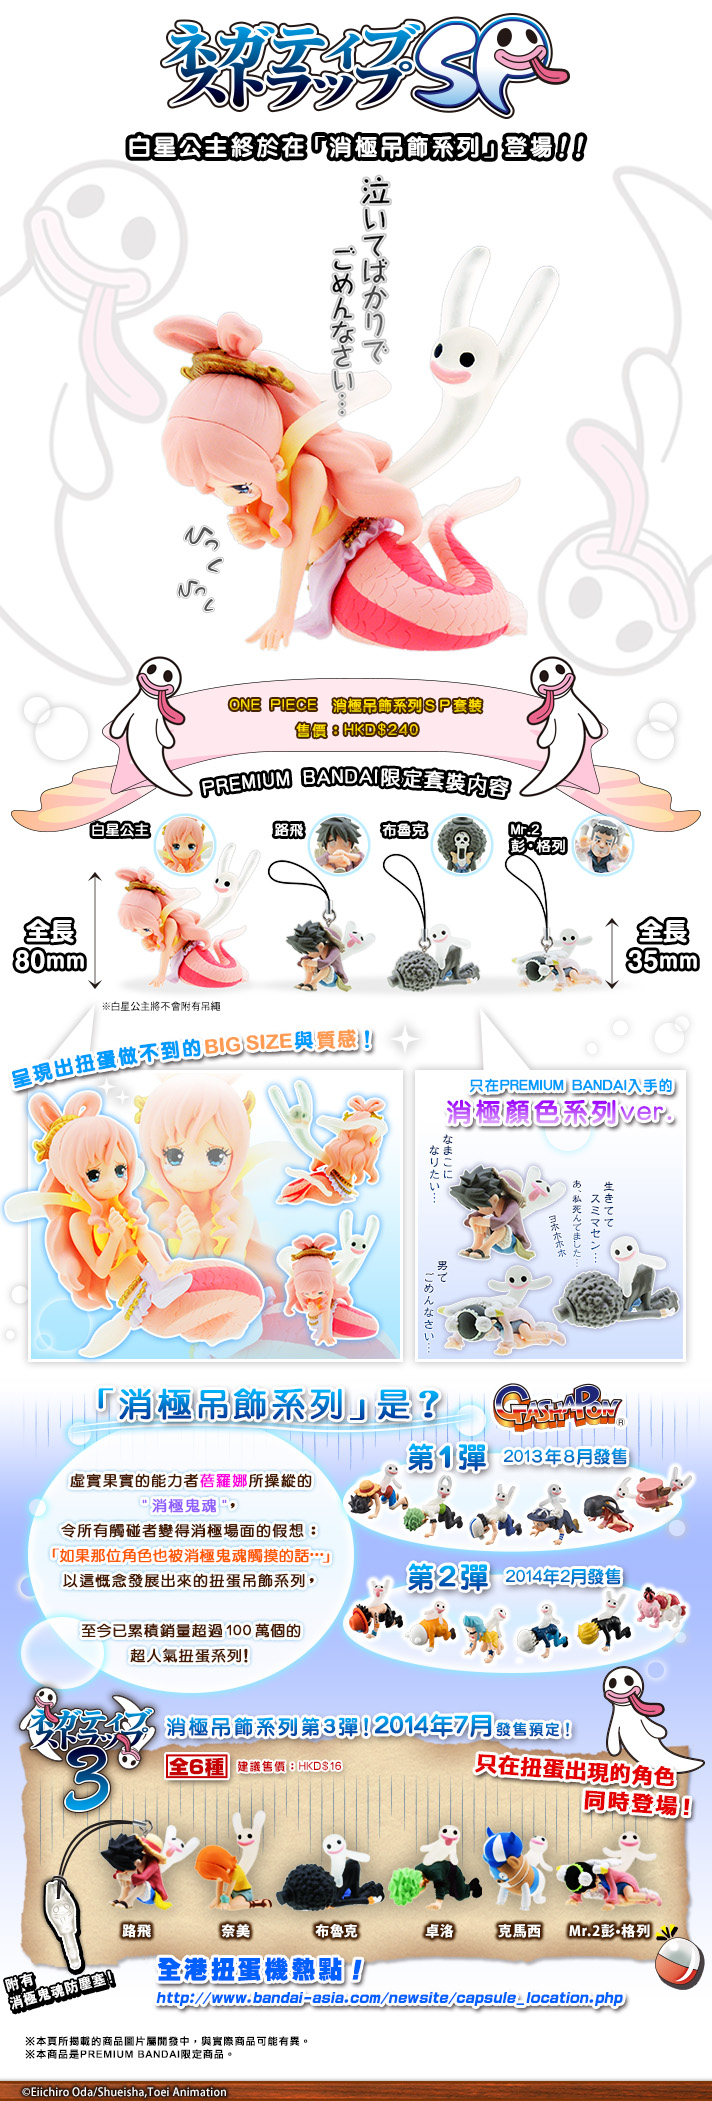 2013 Bandai Gundam Info Limited Tote Bag Shopping Bag Sinanju